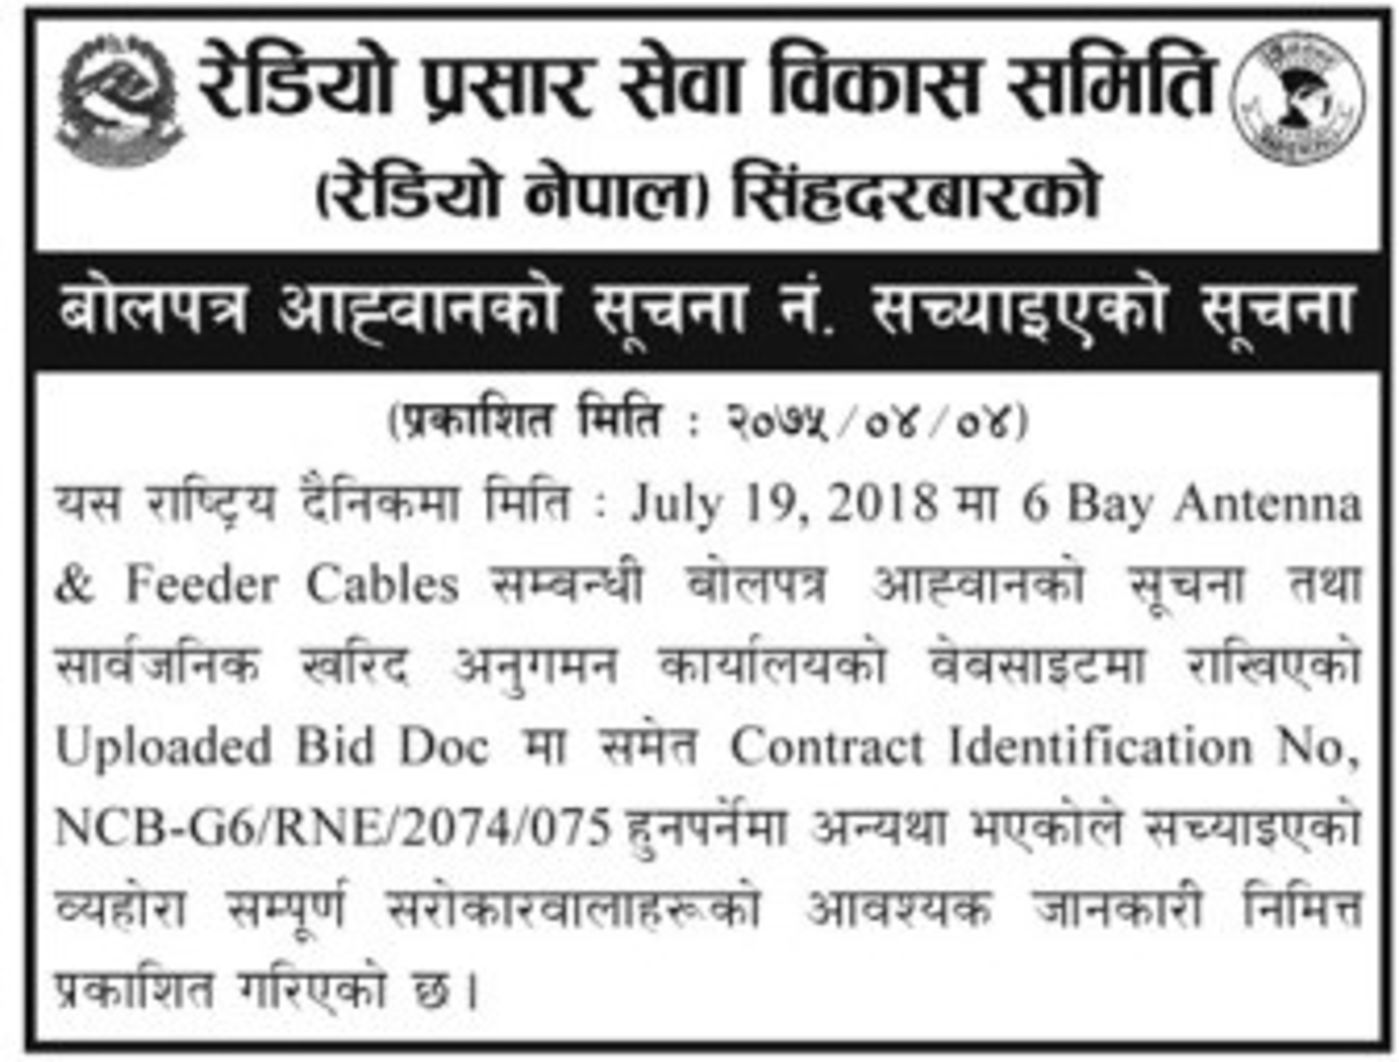 Bids and Tenders Nepal - Correction on Bids - 6 Bay Antenna &Feeder